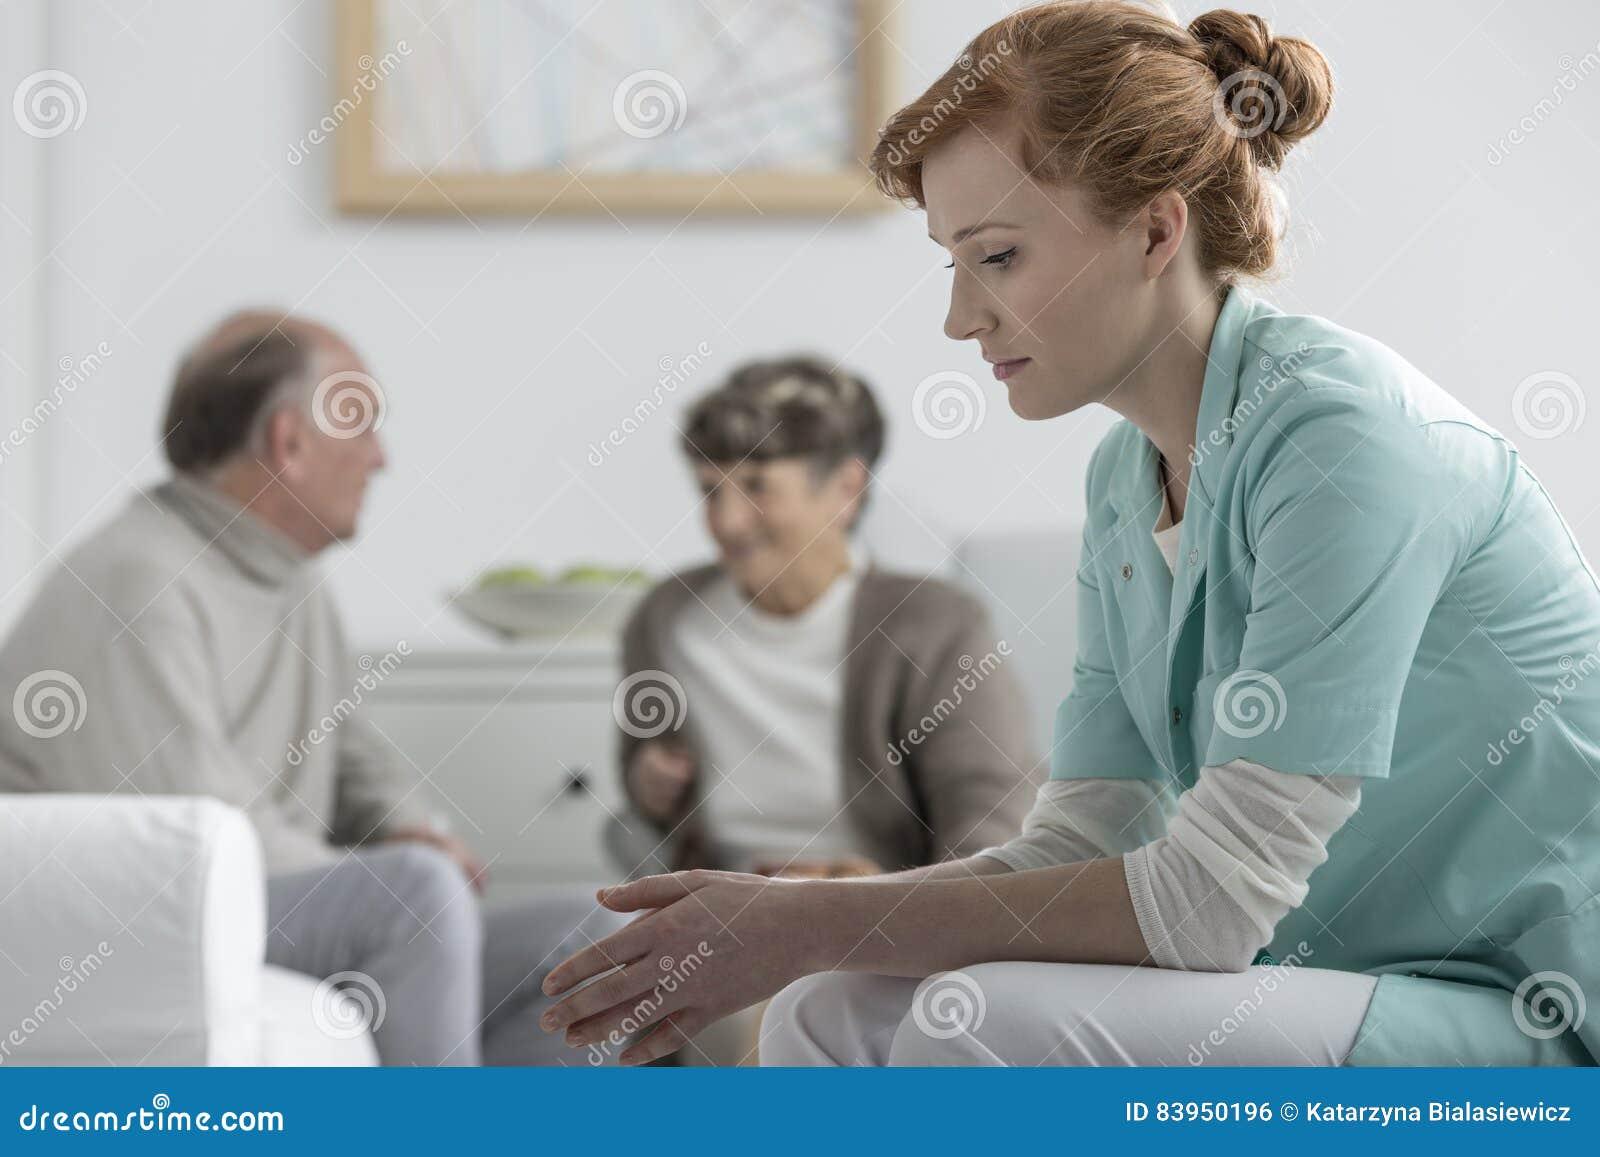 Дом престарелых медсестра дома престарелых в бийске